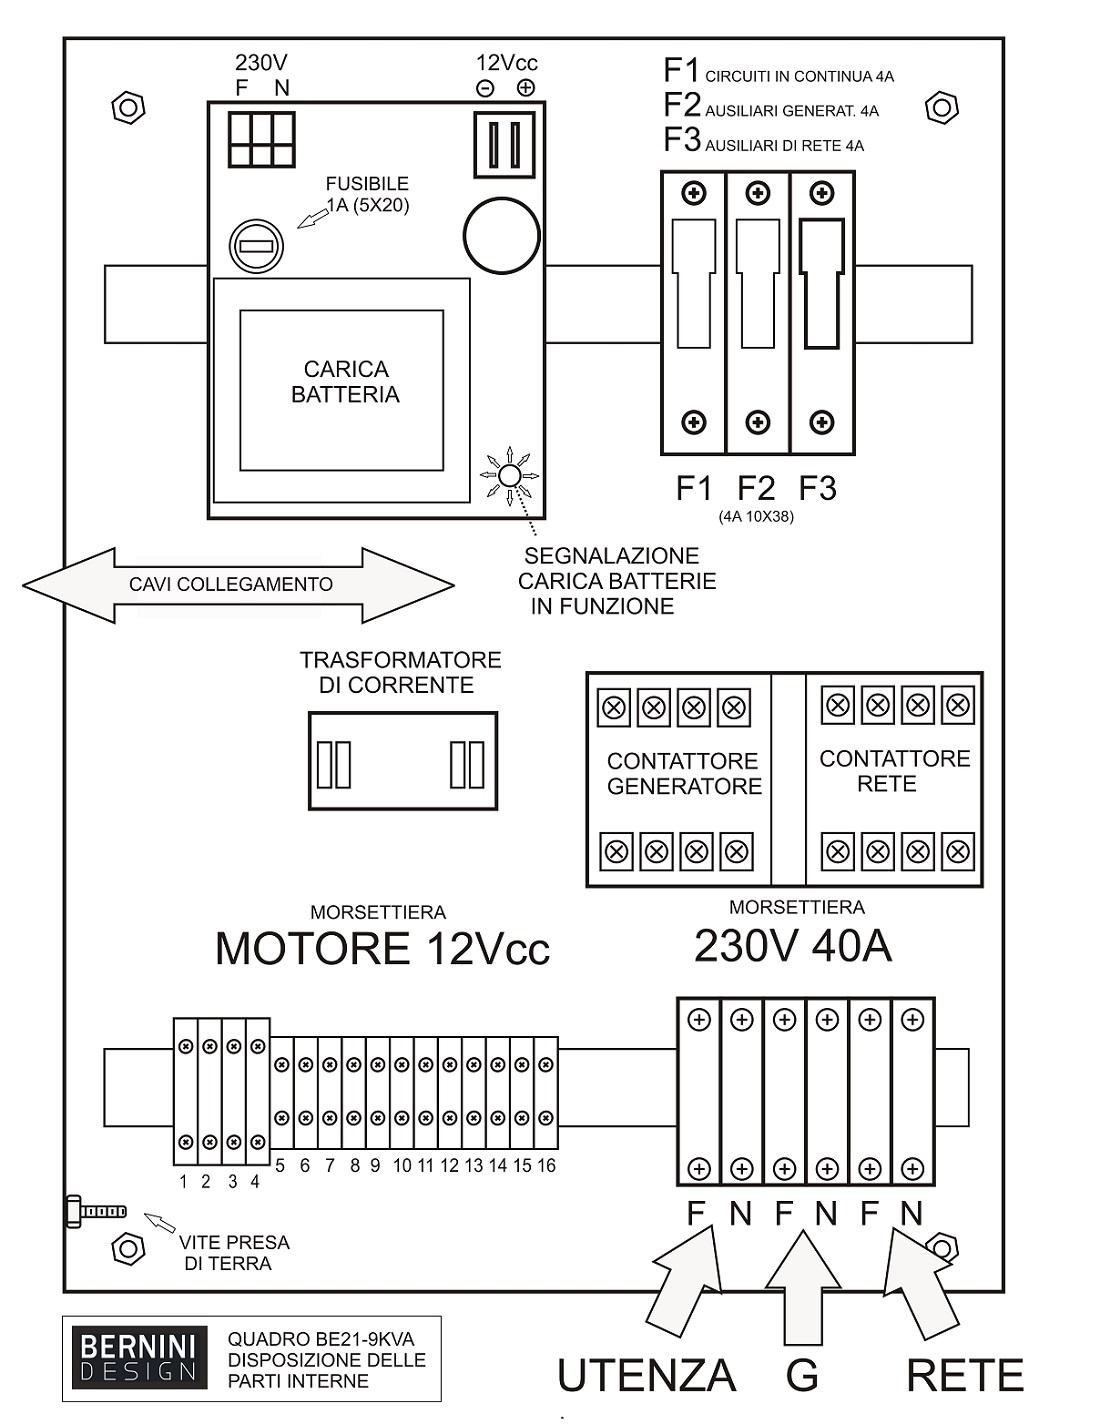 Quadro Automatico Gruppo Elettrogeno 9kva Automatismes